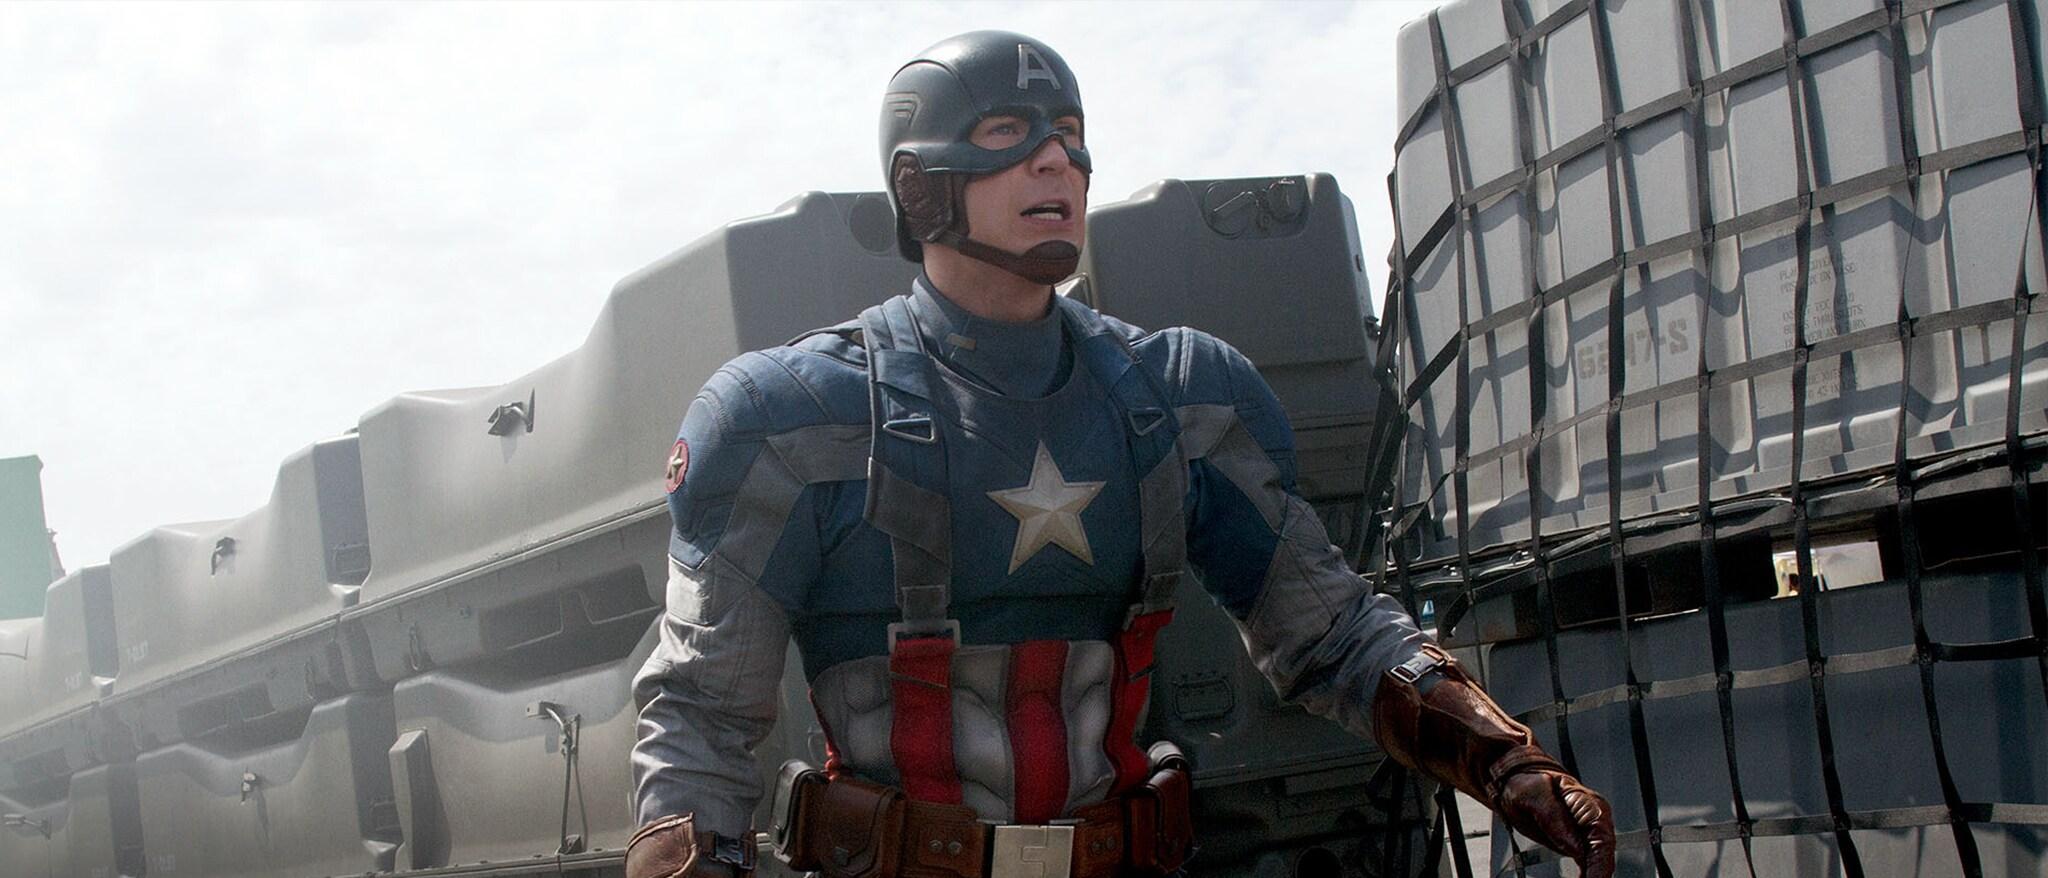 Captain America: The Winter Soldier Hero